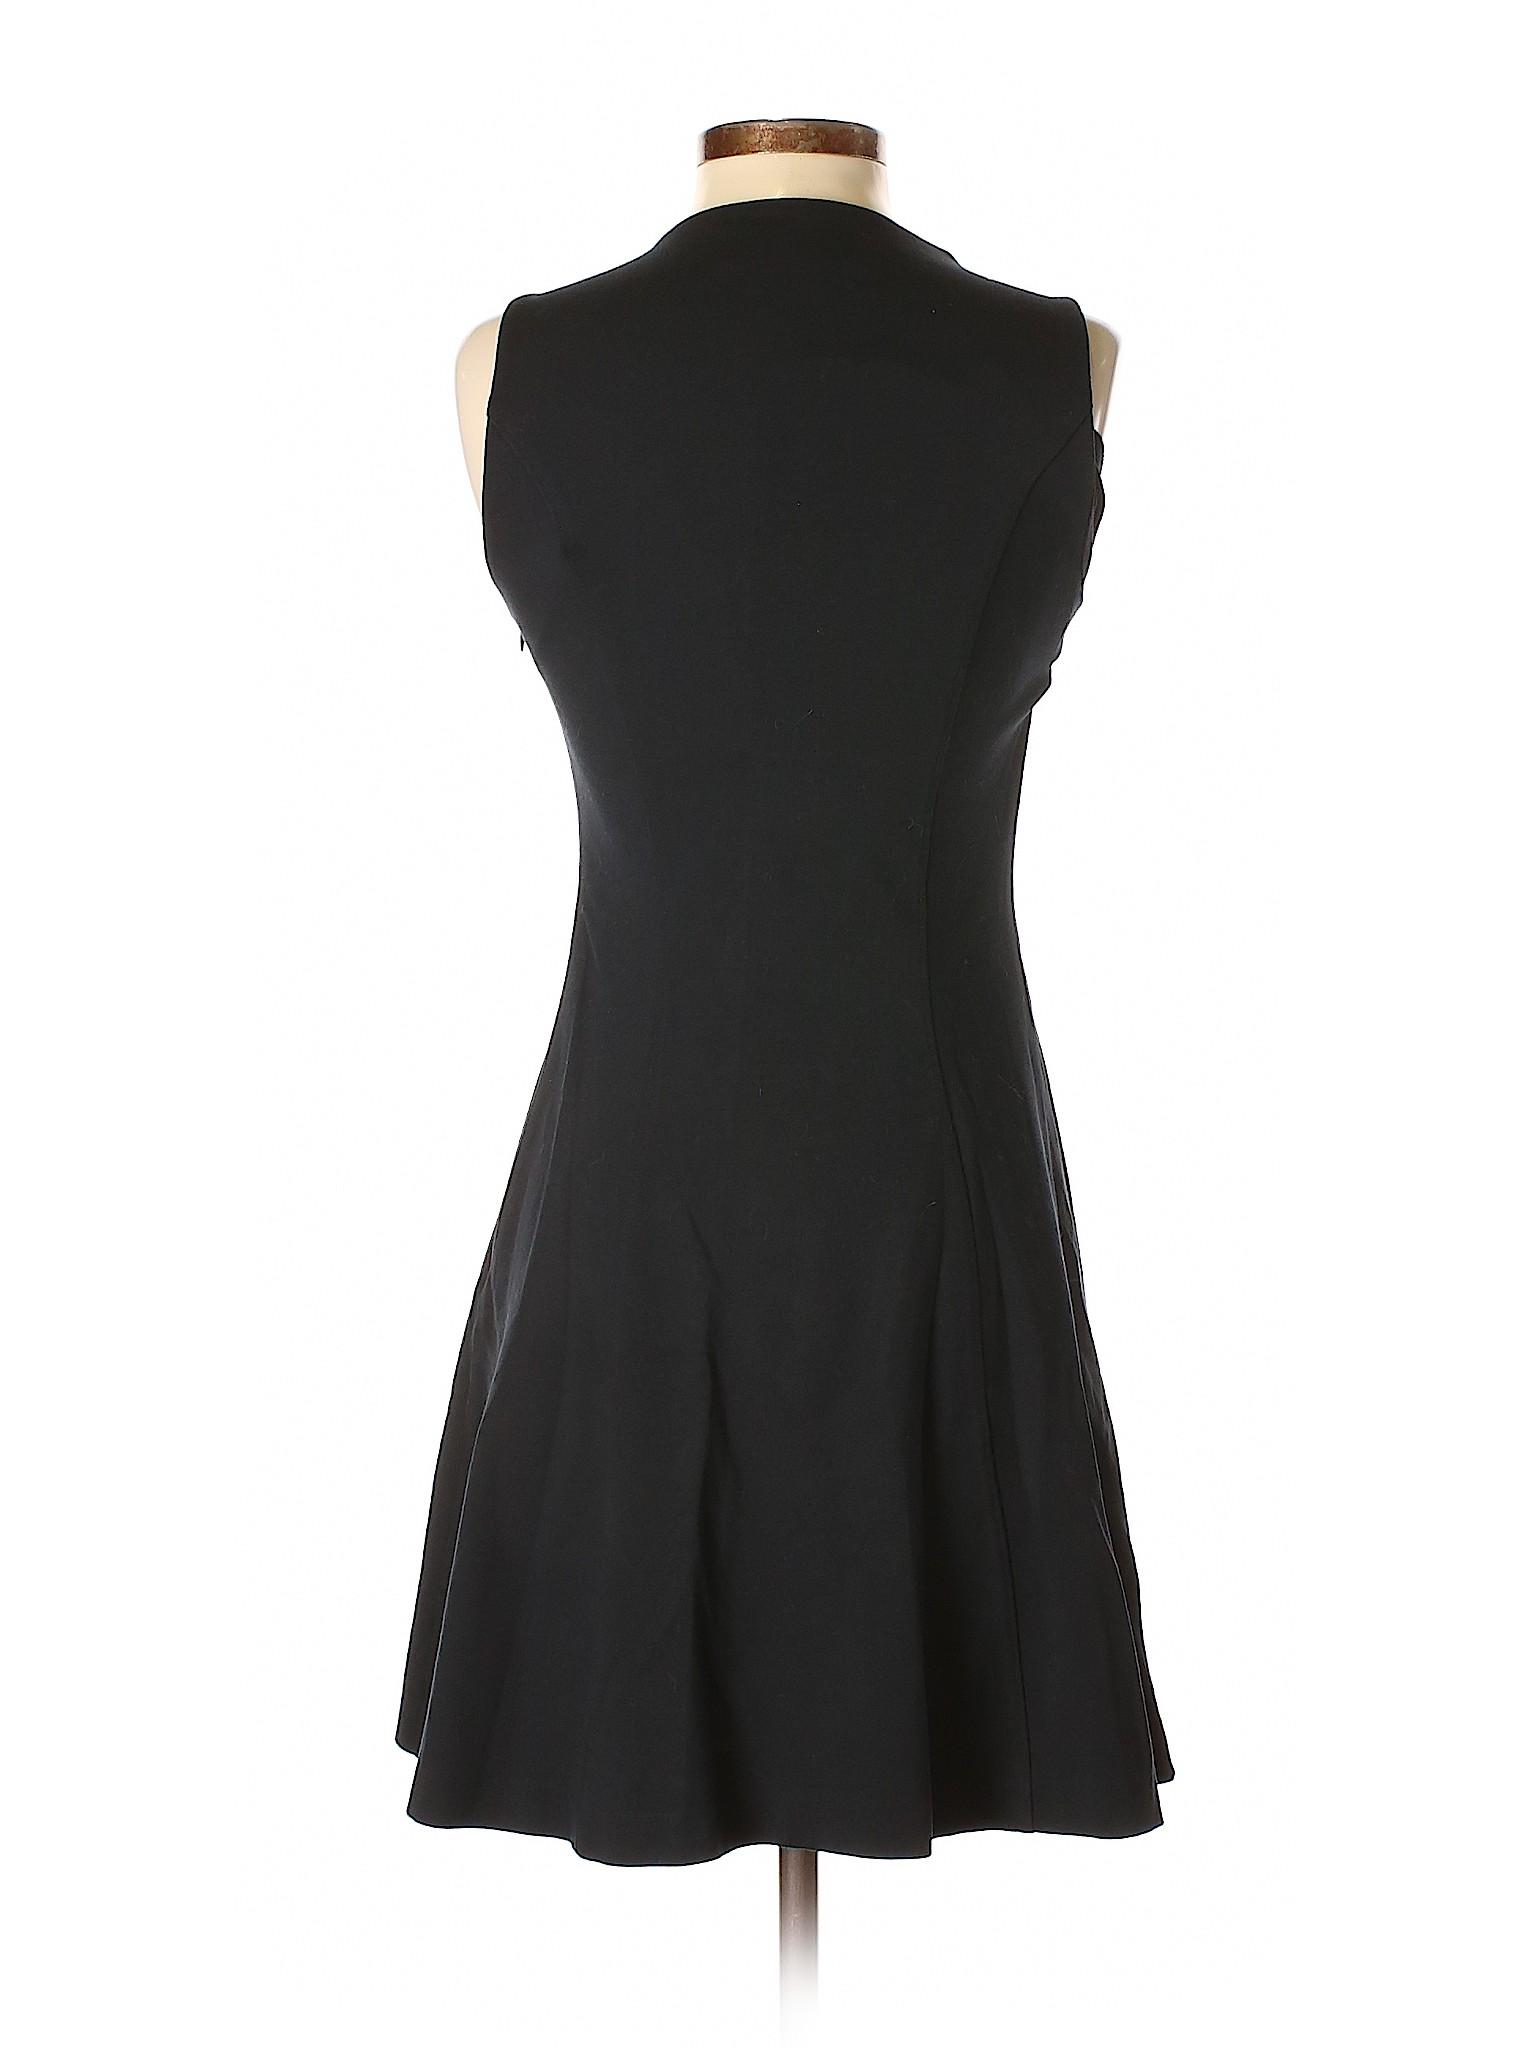 Casual Dress Dress C Selling Casual Selling Wonder Wonder C Selling Hzq48x58Bw